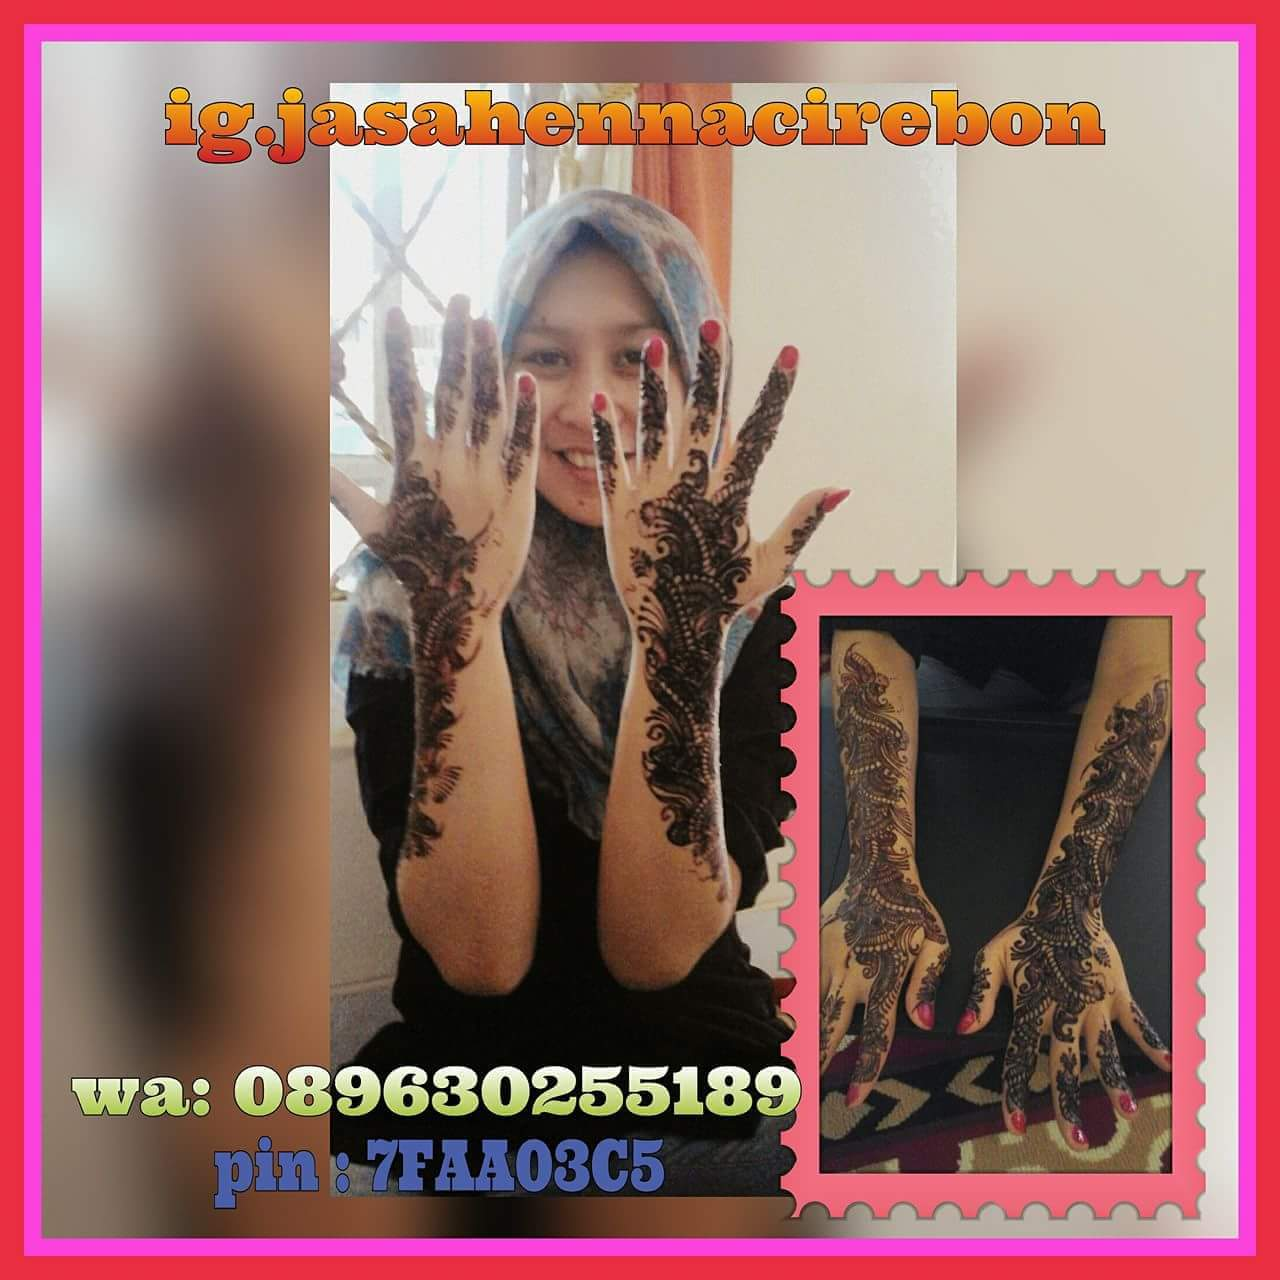 Jasa Henna Cirebon JASA LUKIS HENNA